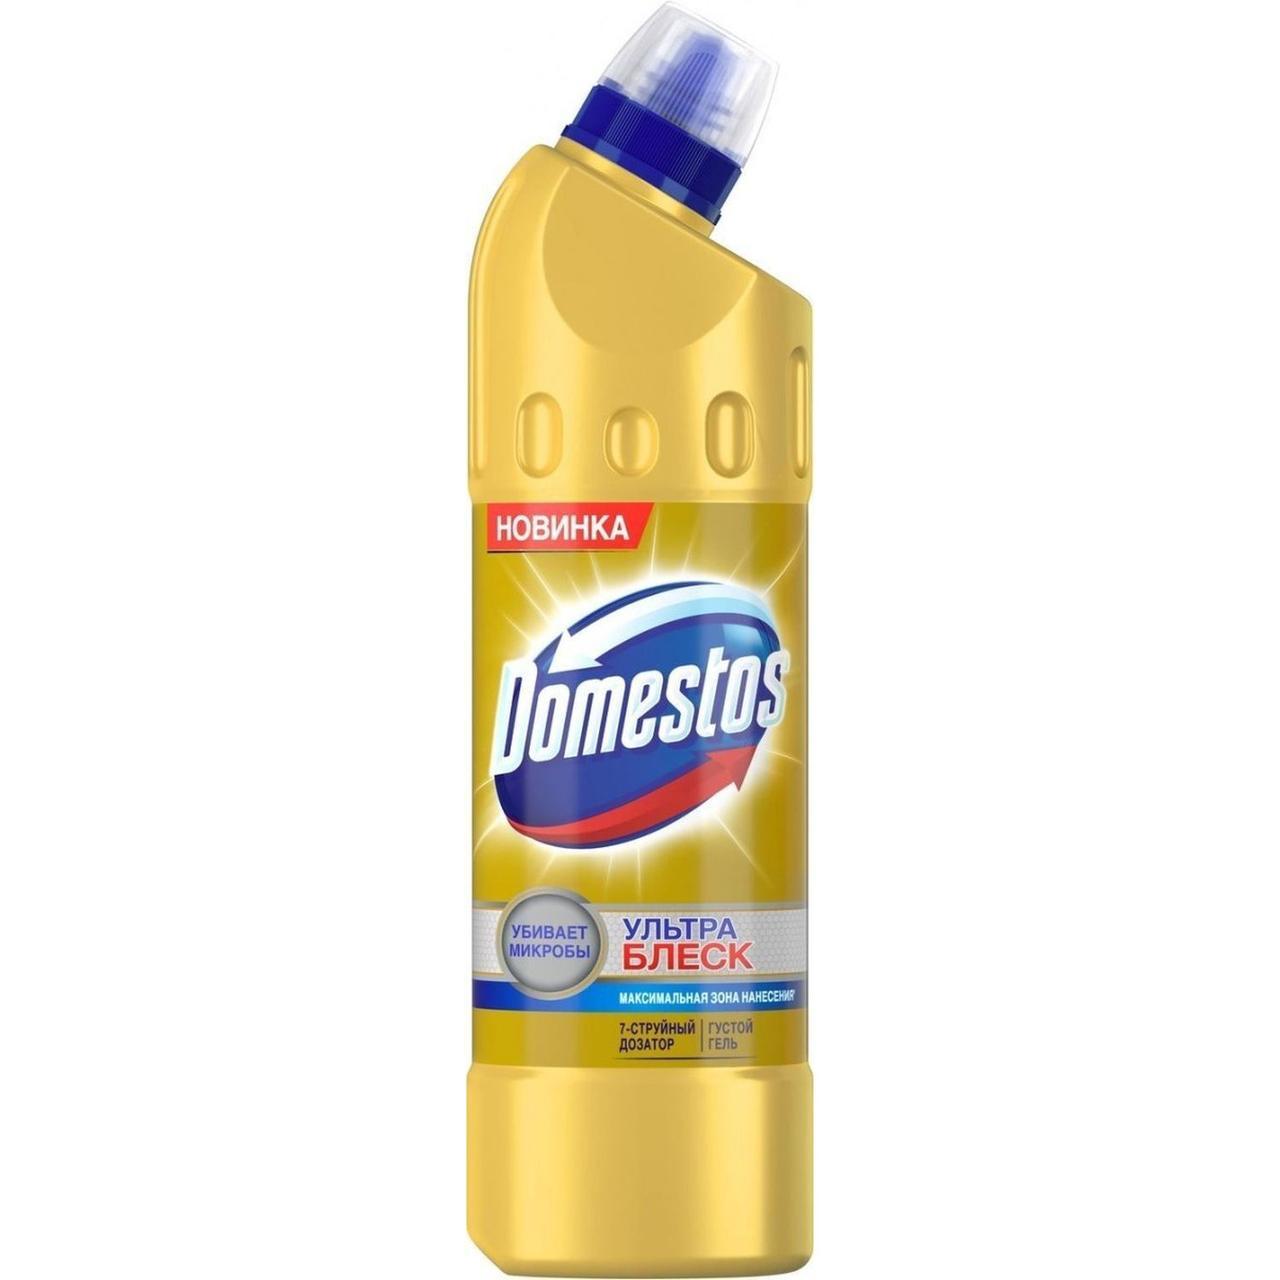 Domestos моющее средство